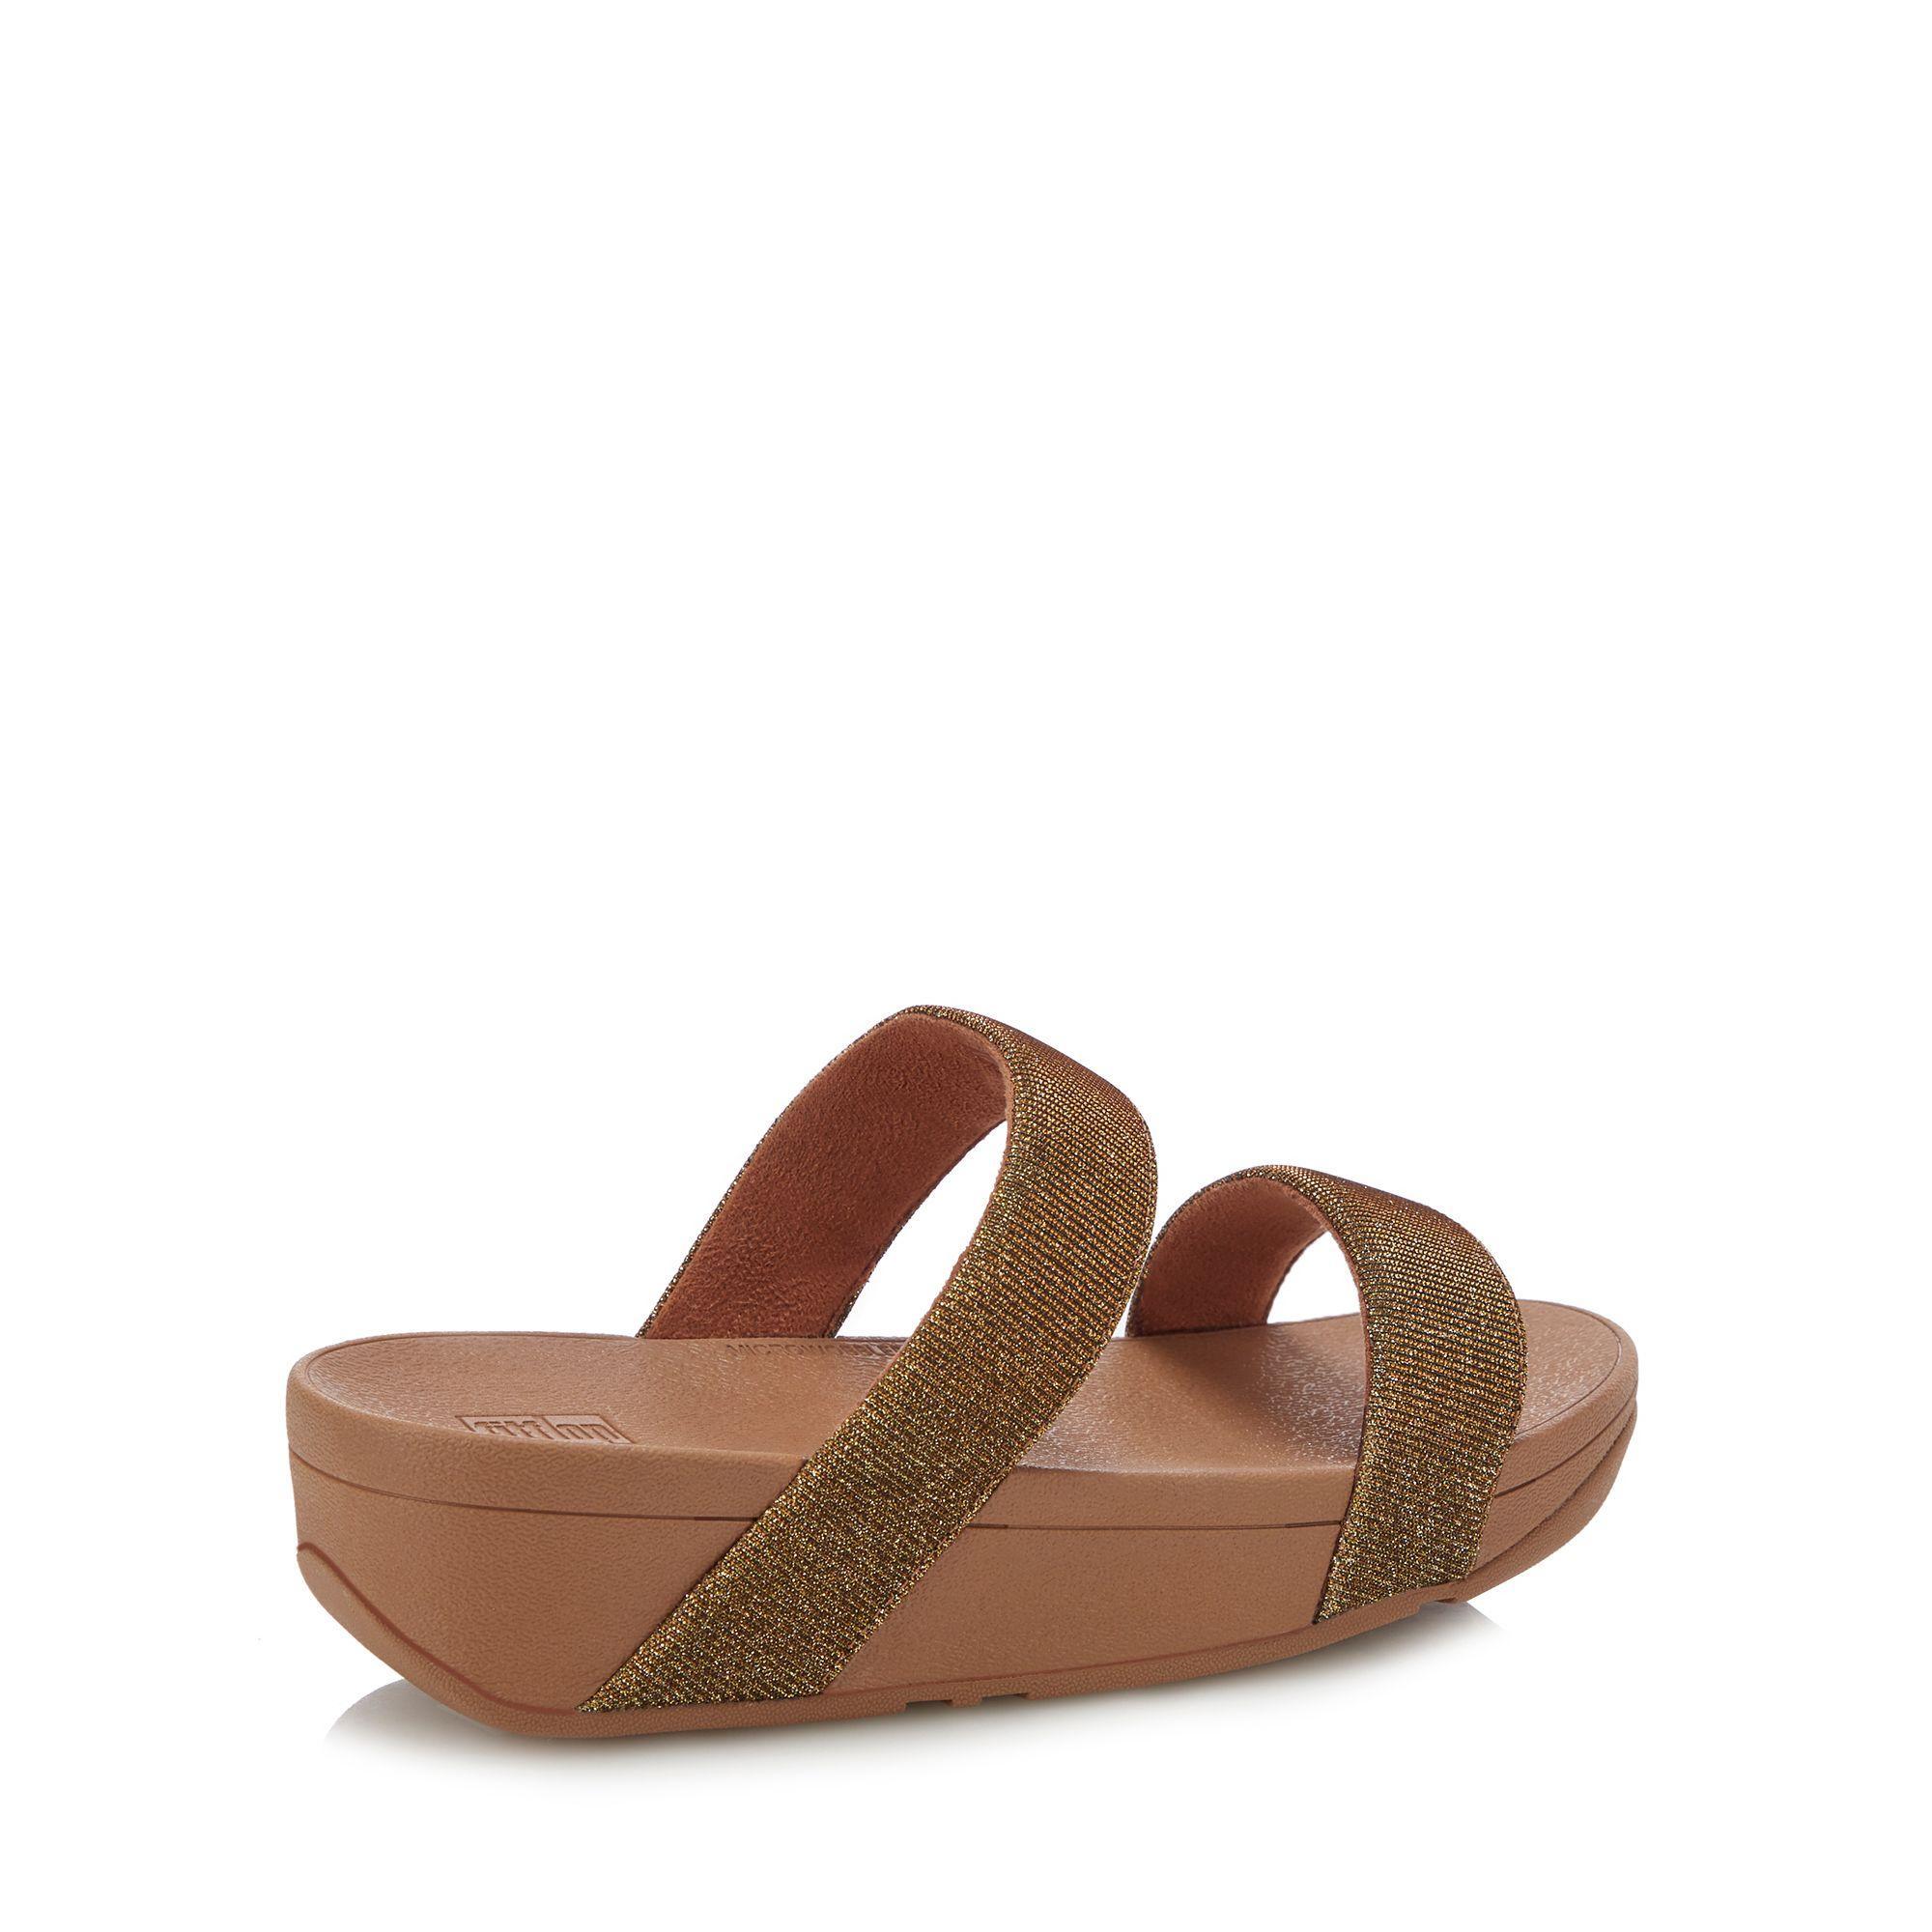 9653d8757c03 Fitflop - Metallic Gold  lottie Glitzy  Wedge Heel Sandals - Lyst. View  fullscreen